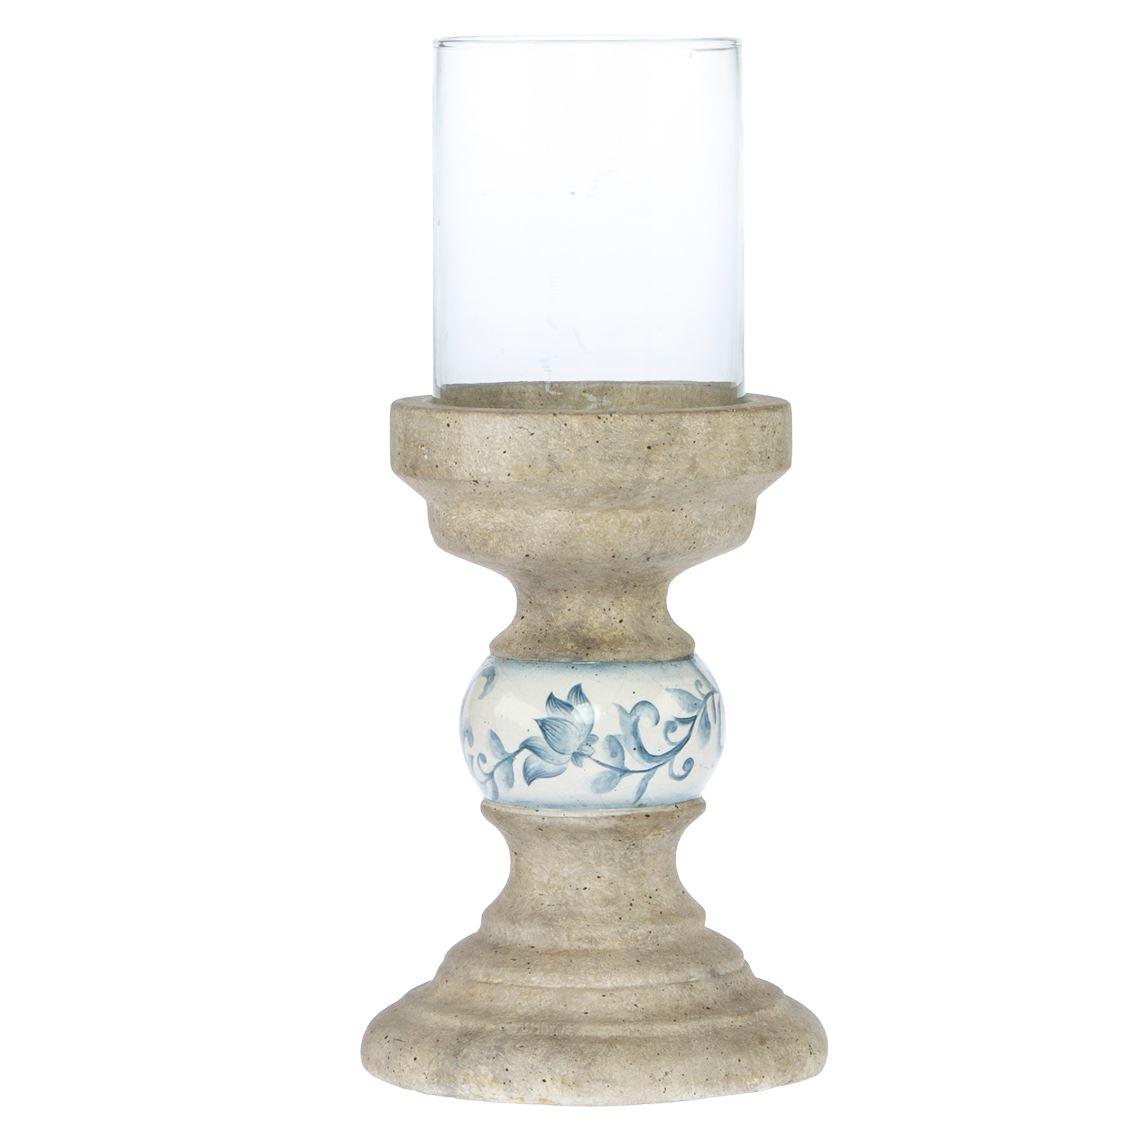 Tokiko Lantern Cream / Blue Size W 18cm x D 18cm x H 18cm in Cream/Blue Freedom